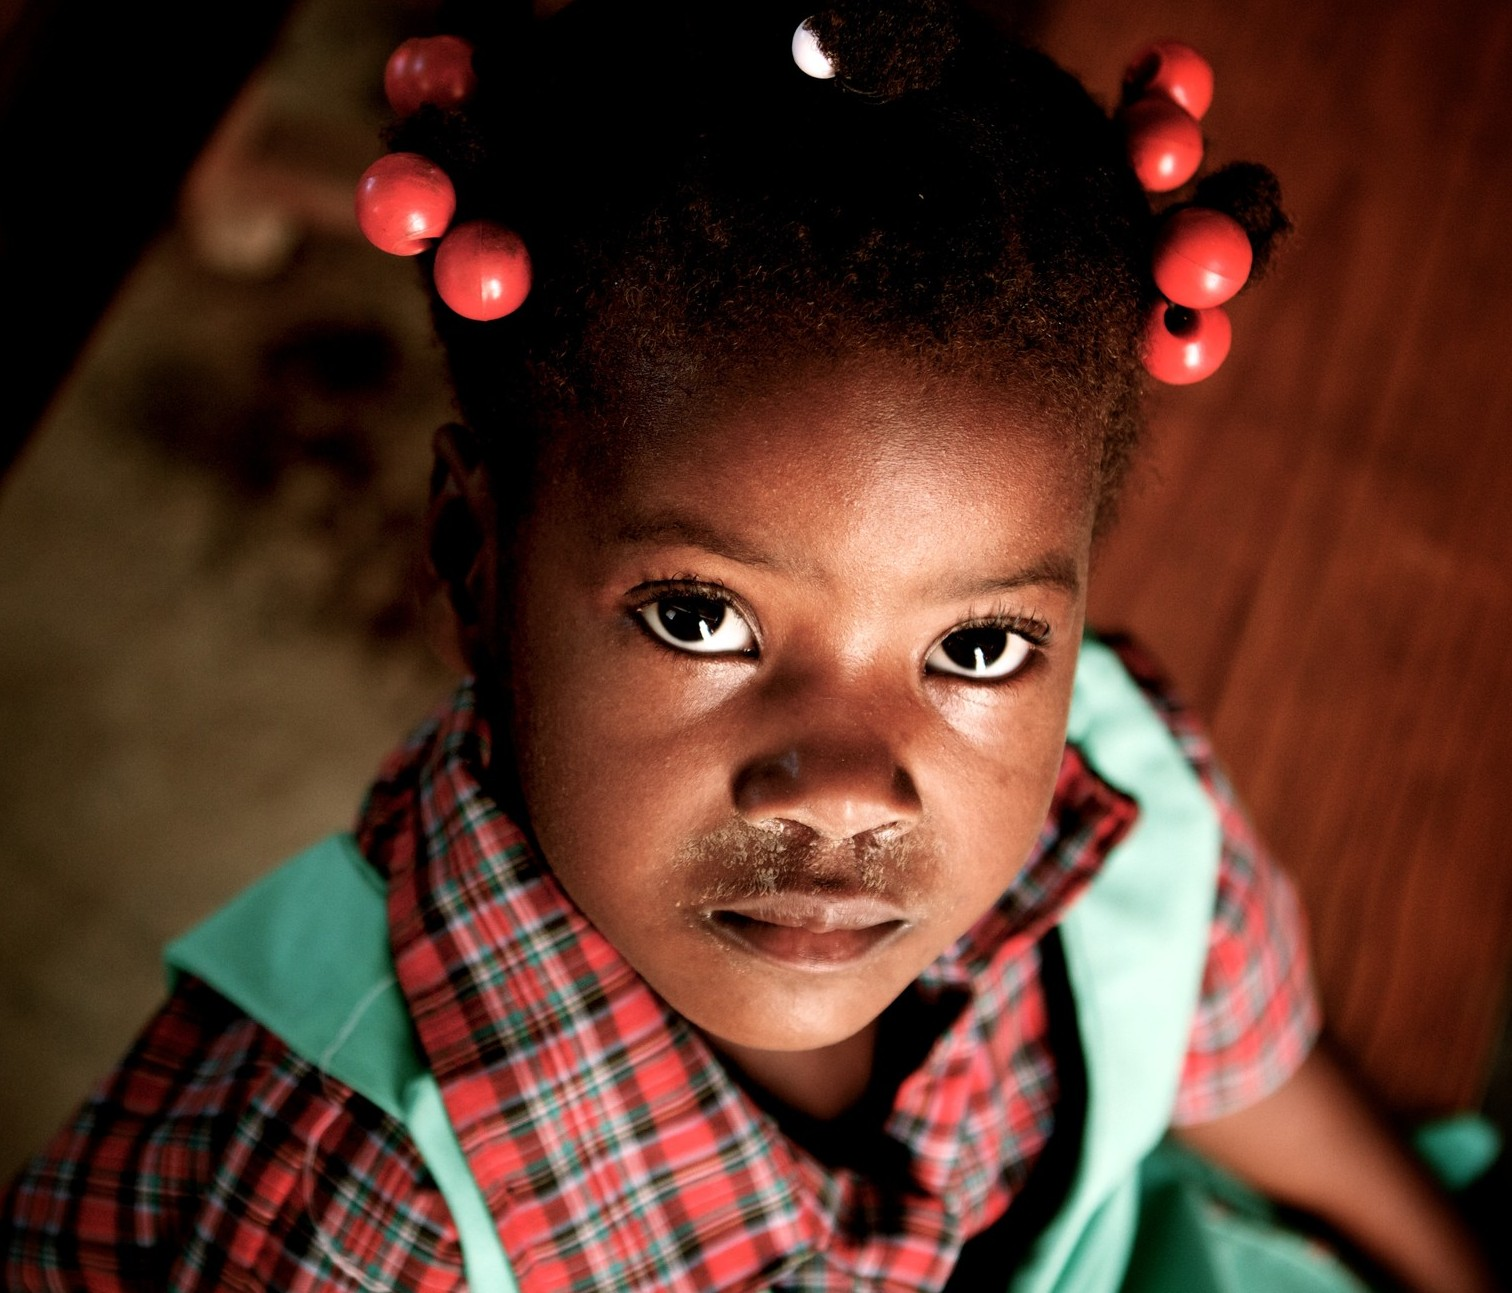 Foster care program assists children in Haiti